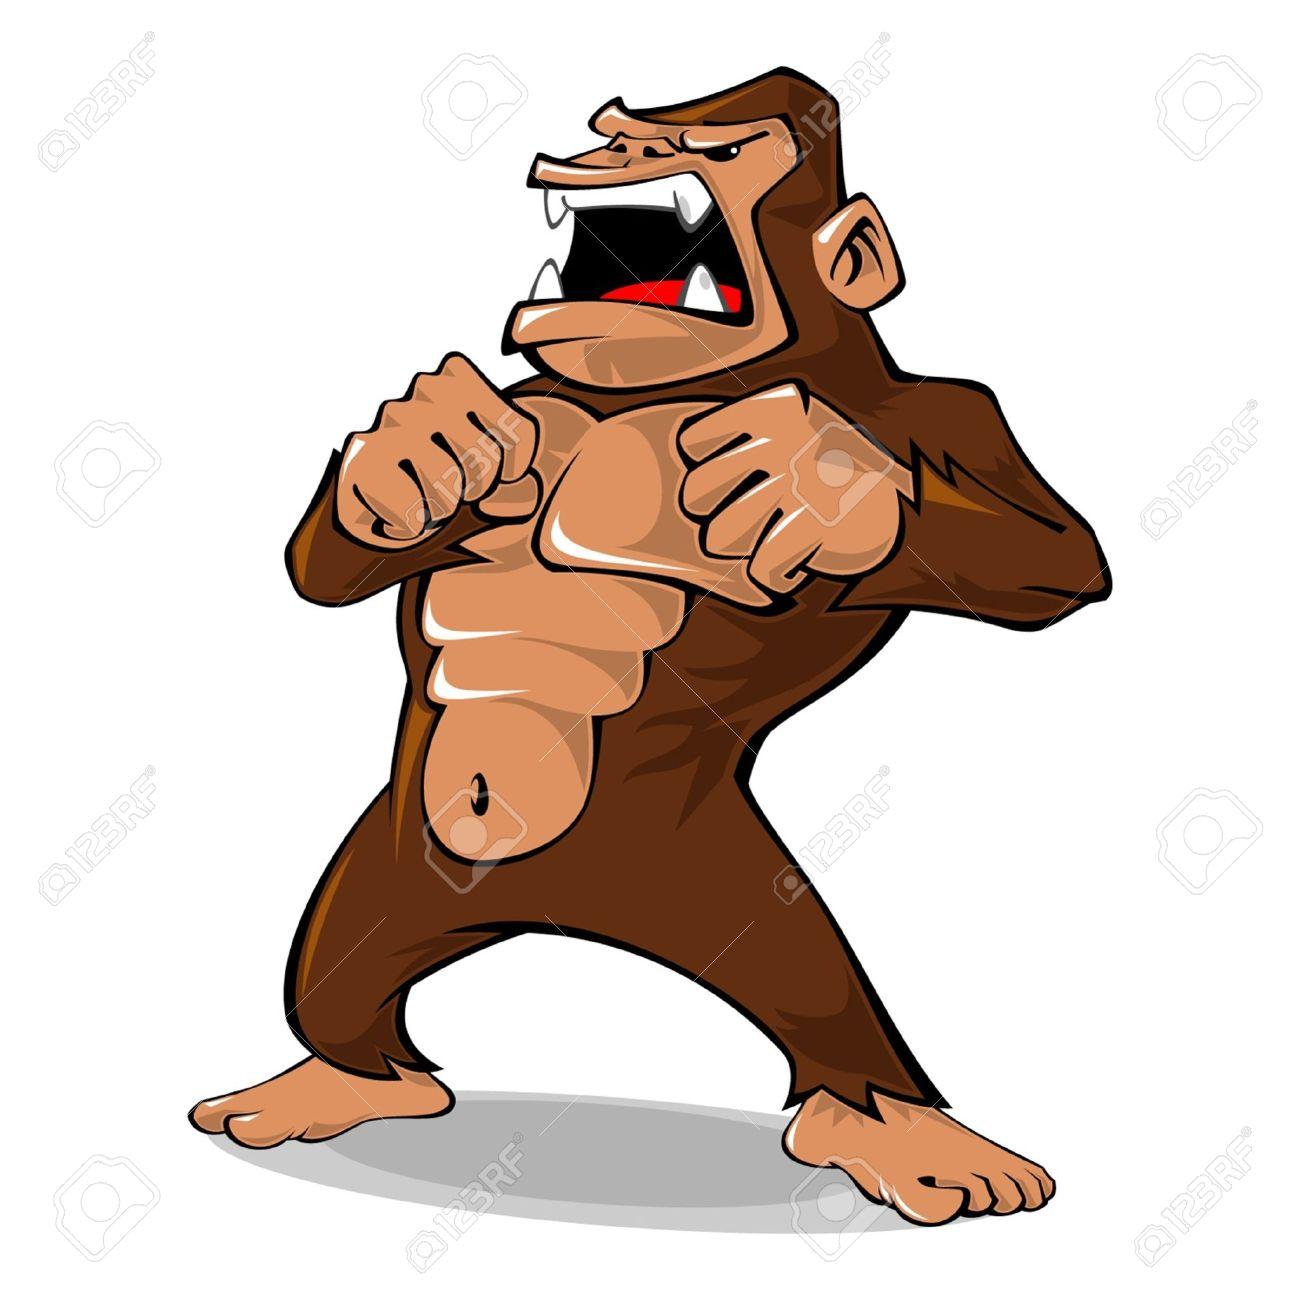 24 561 gorilla stock vector illustration and royalty free gorilla rh 123rf com gorilla clipart easy gorilla clipart gif